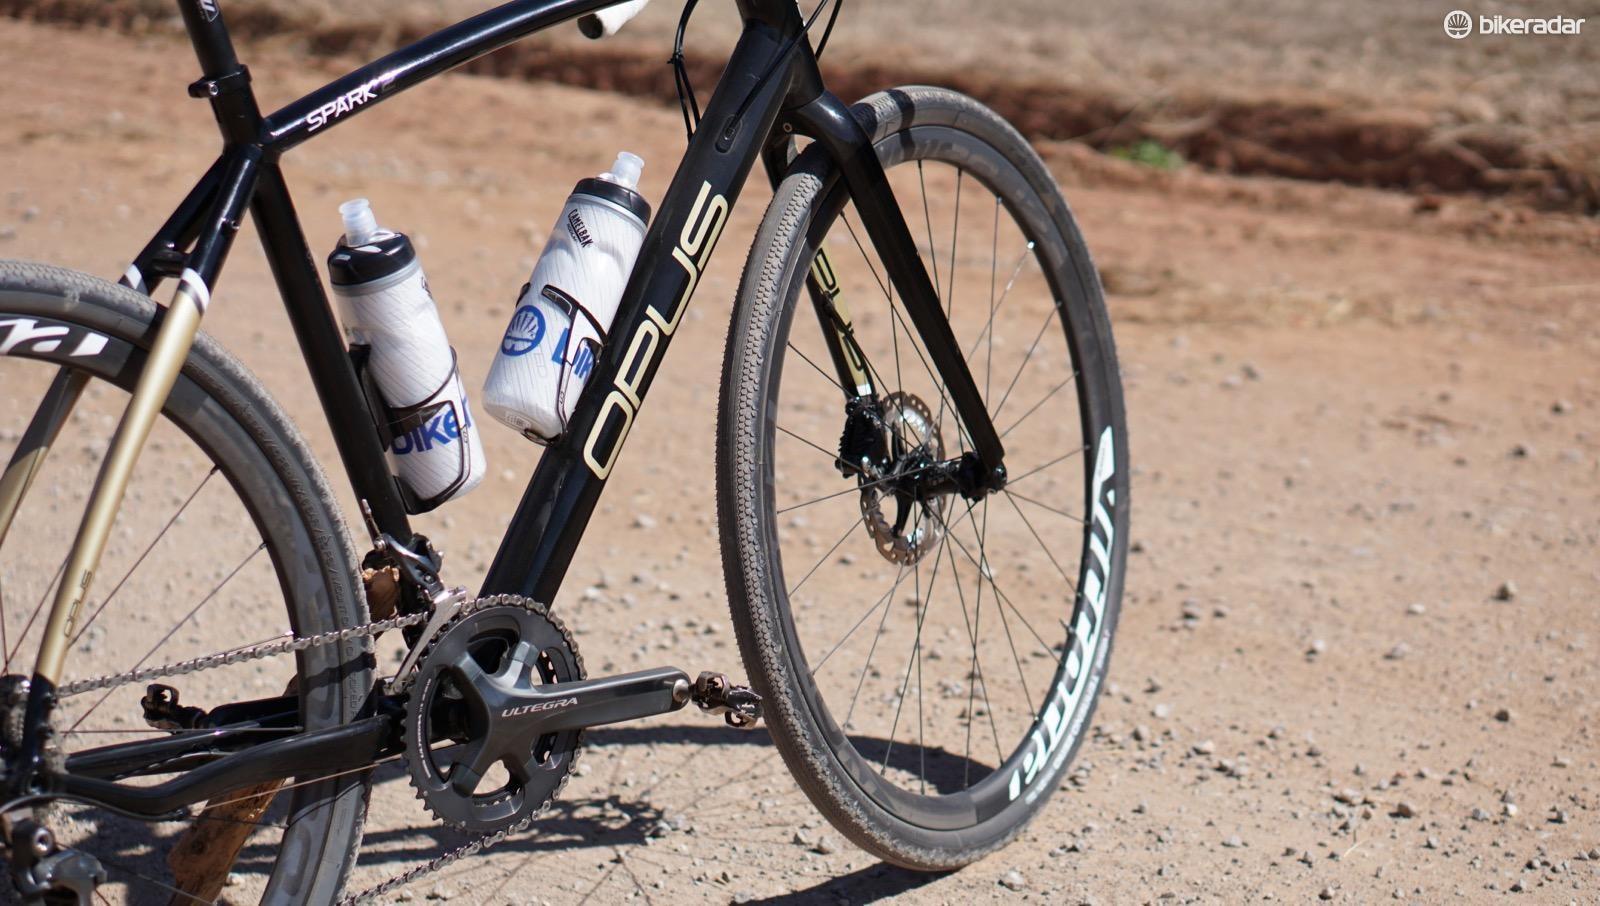 The Terreno Zero tires roll fast in dry gravel conditions